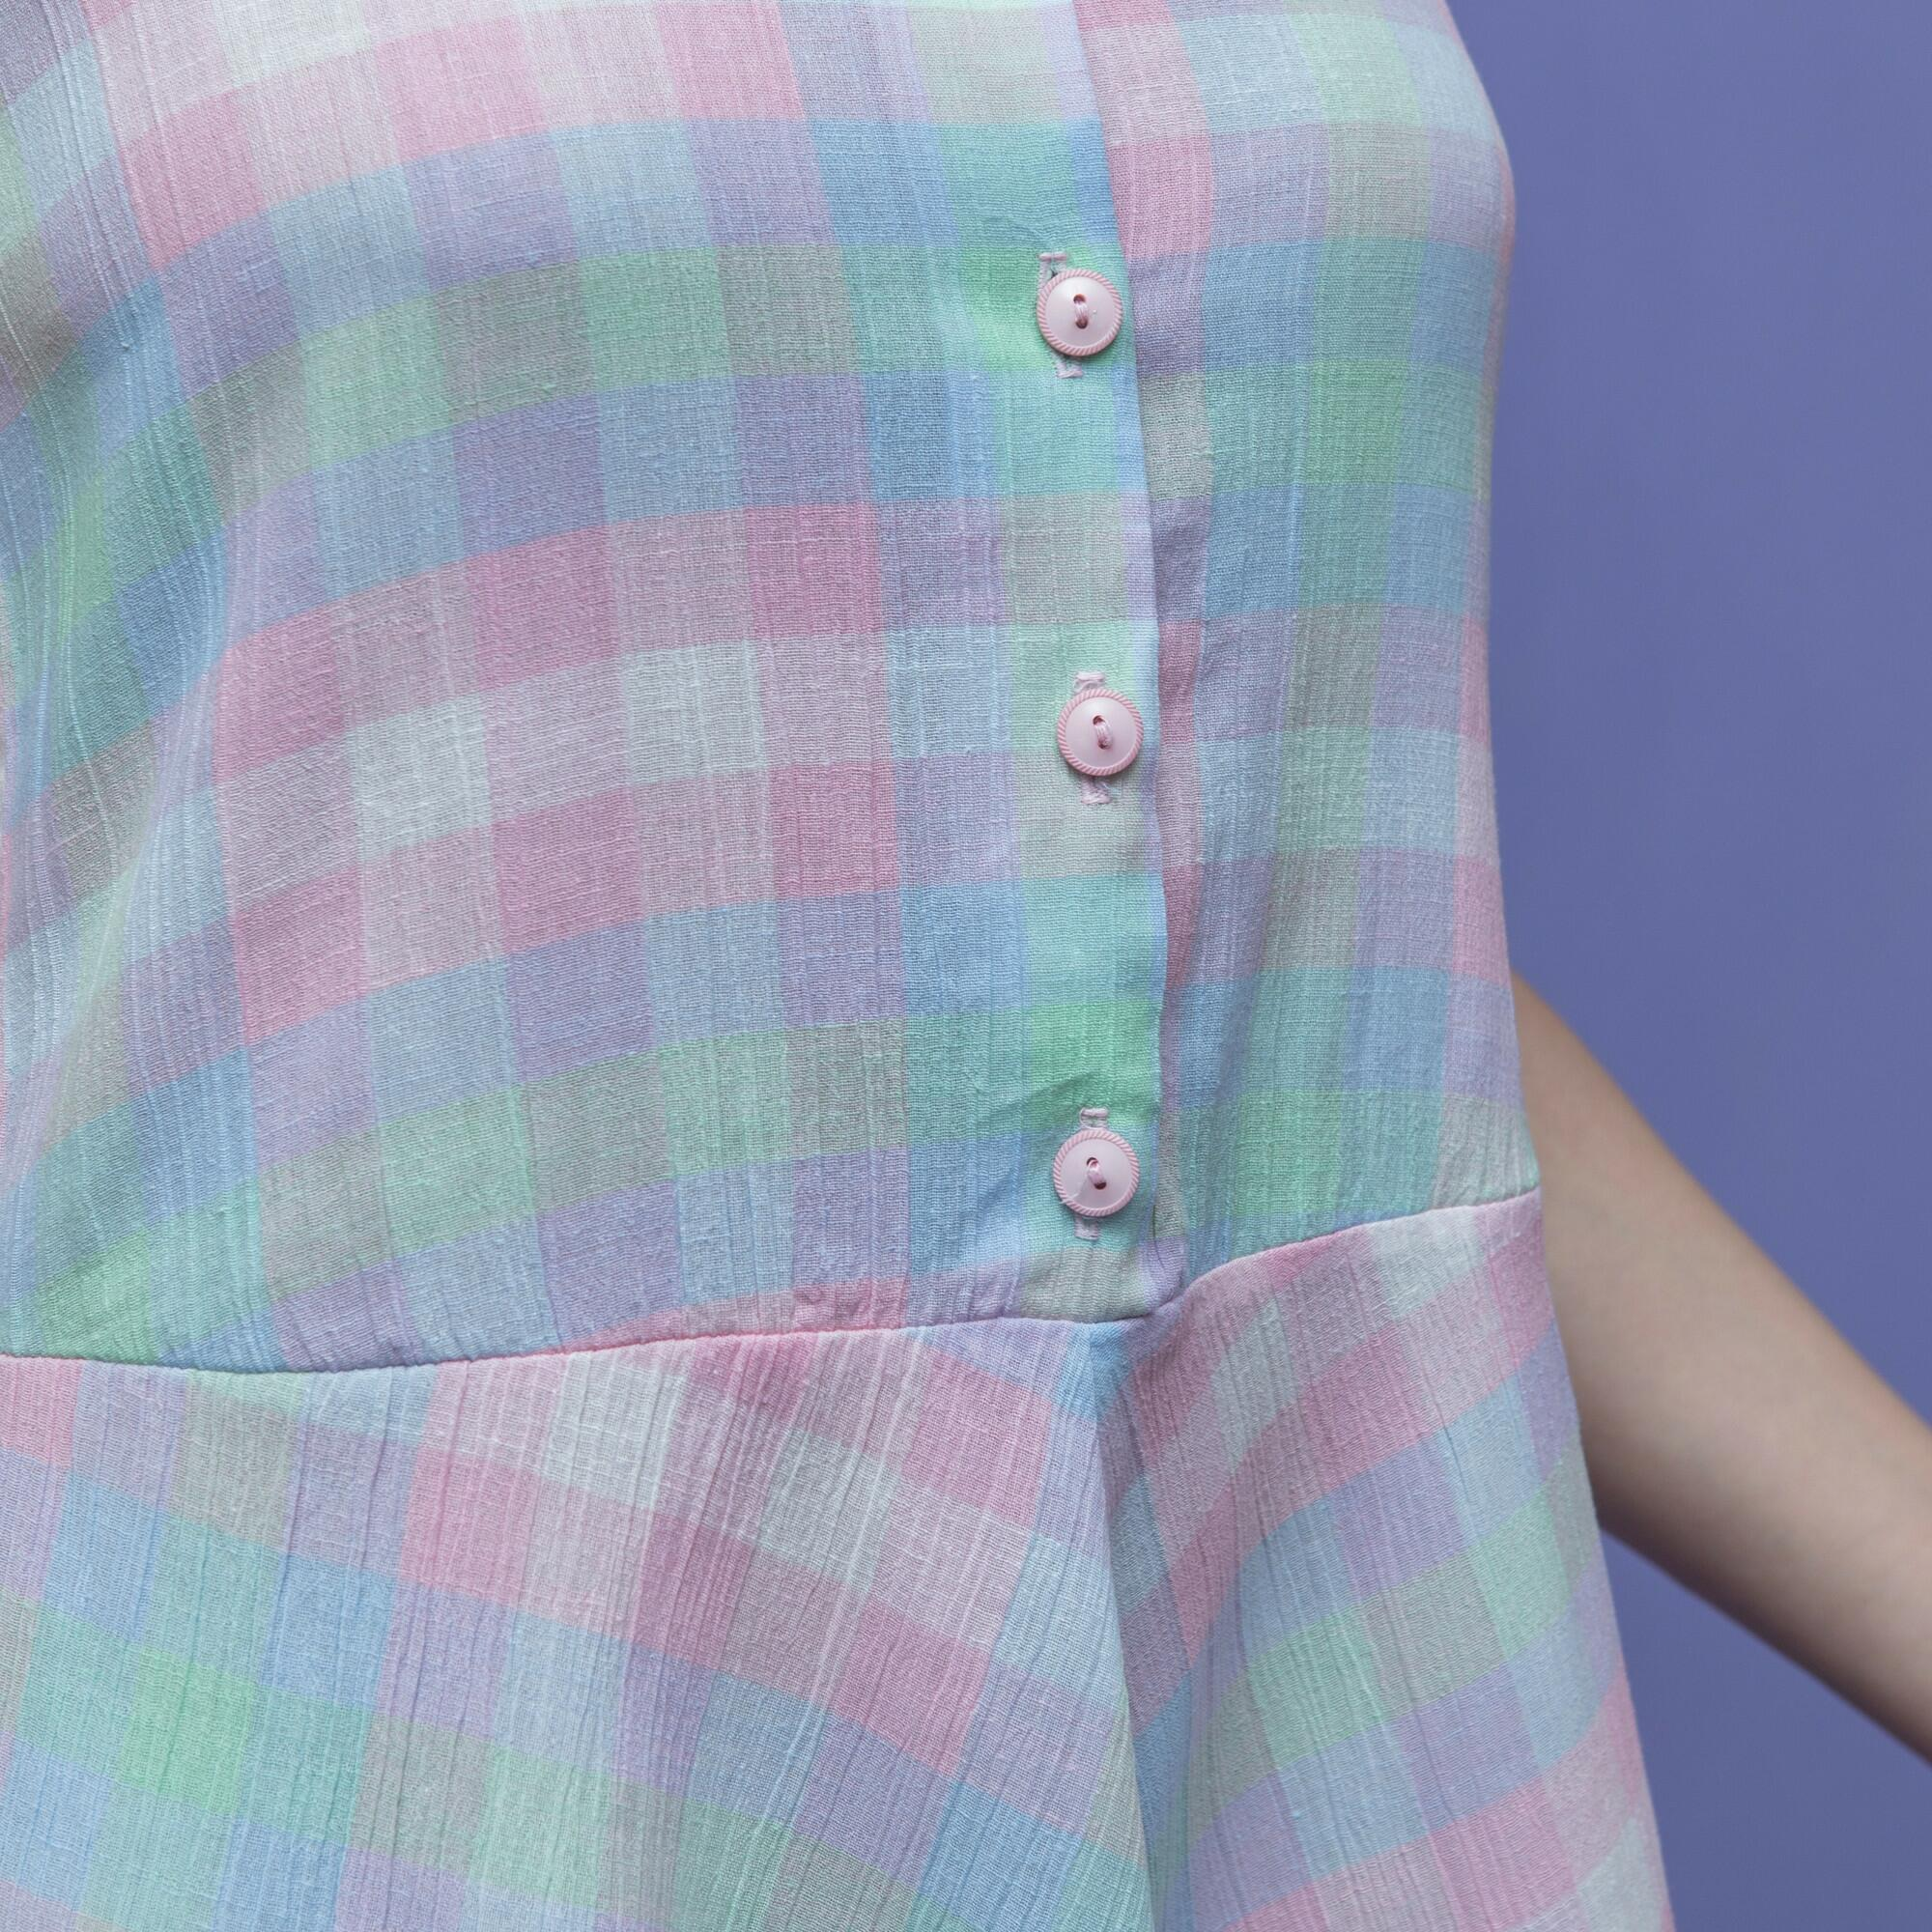 Pastelowa sukienka w kratkę - KEX Vintage Store | JestemSlow.pl